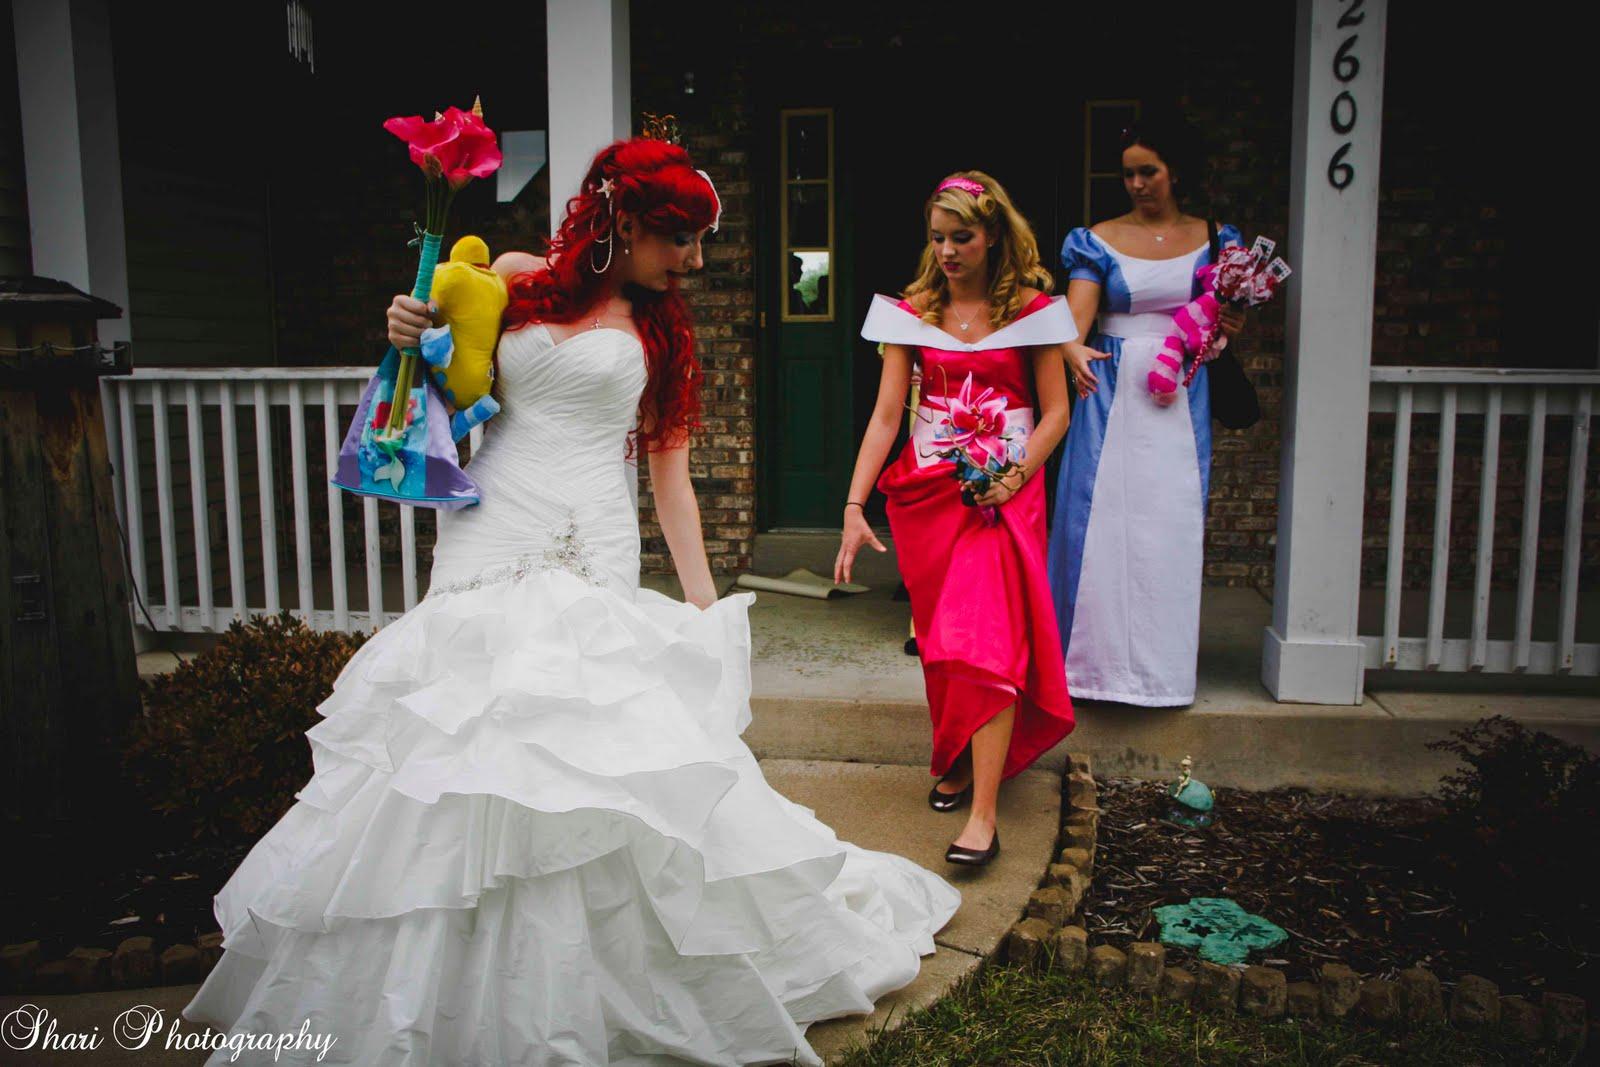 Ariel disney wedding themed dresses fashion dresses ariel disney wedding themed dresses ombrellifo Choice Image